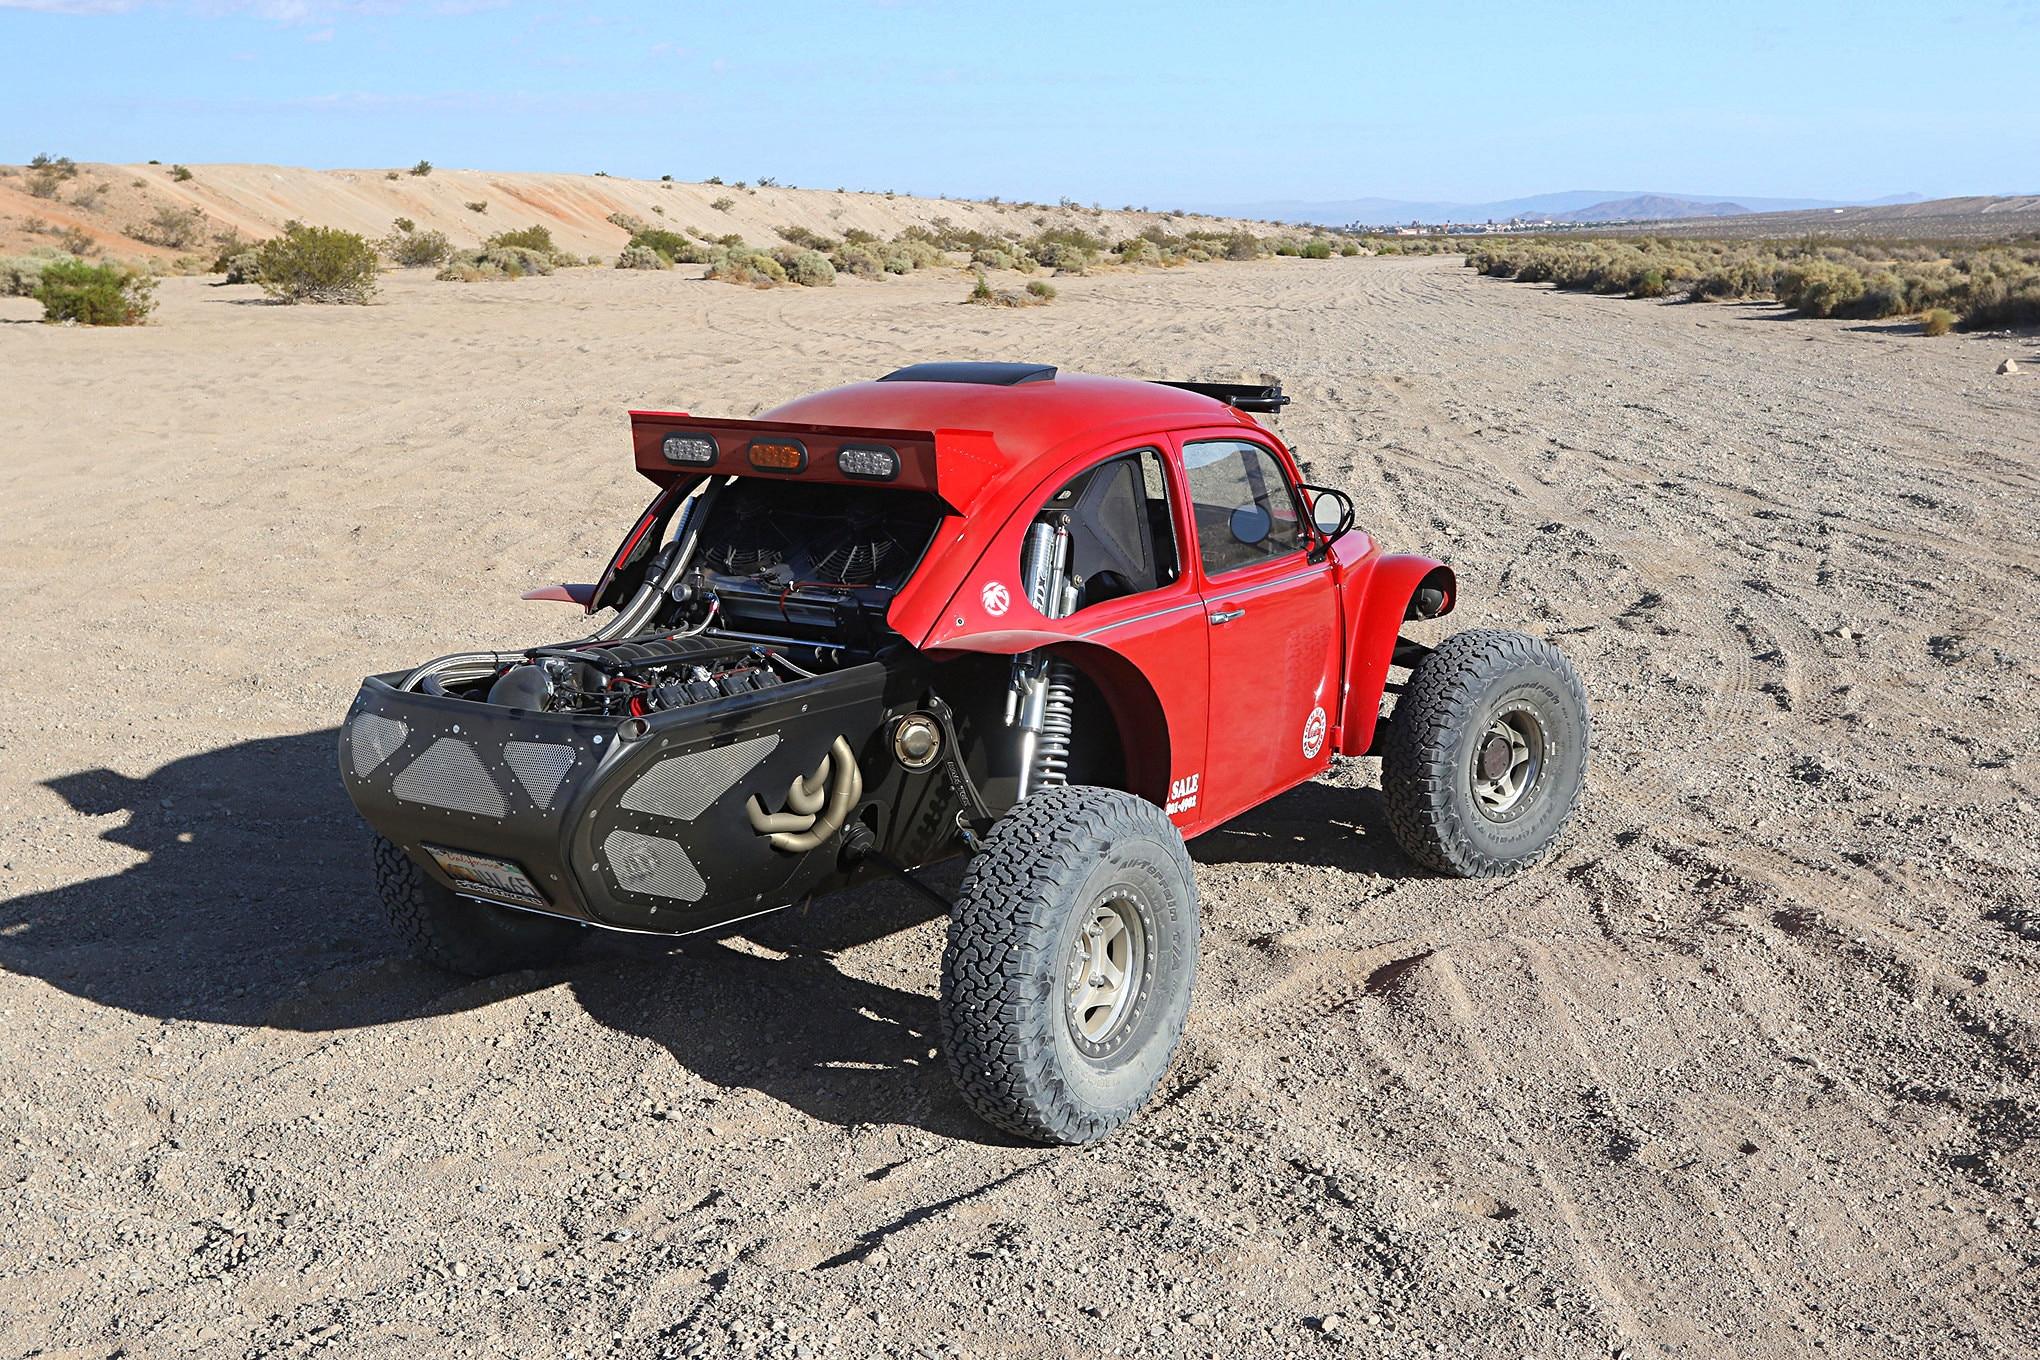 021 vw baja bug bfg walker evans pro am tough light fox chevy ls1 rear three quarter high down.JPG